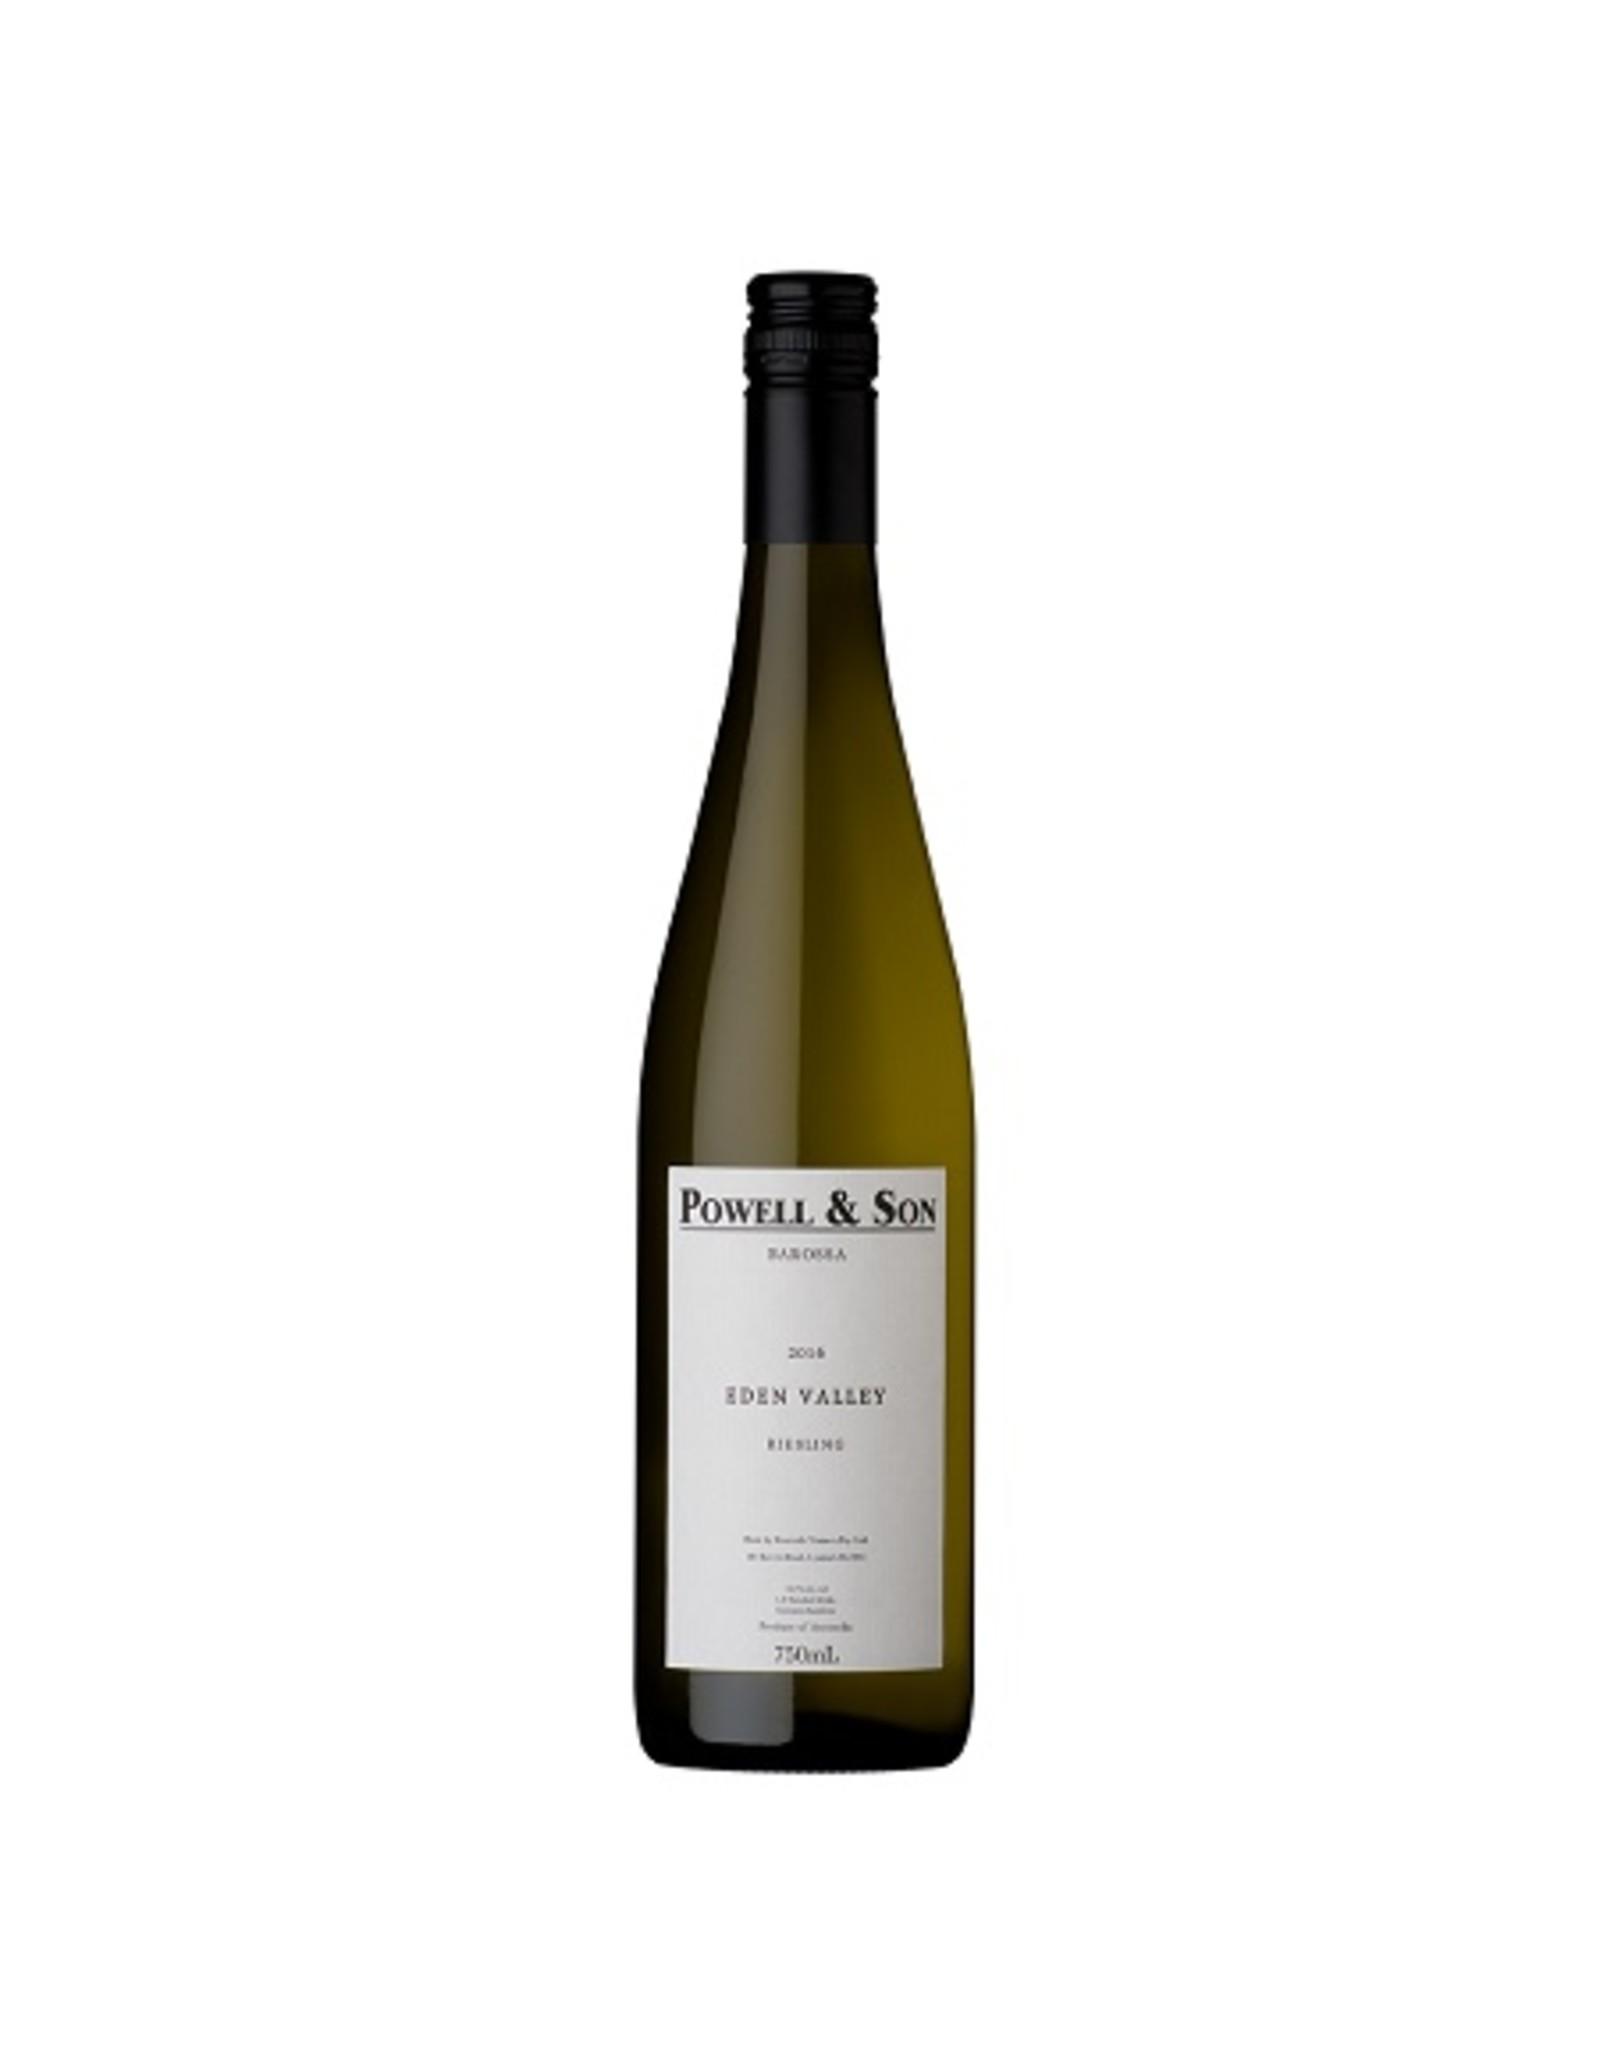 White Wine 2016, Powell & Son, Riesling, Eden Valley, Barossa, Australia, 12.5% Alc., RP91